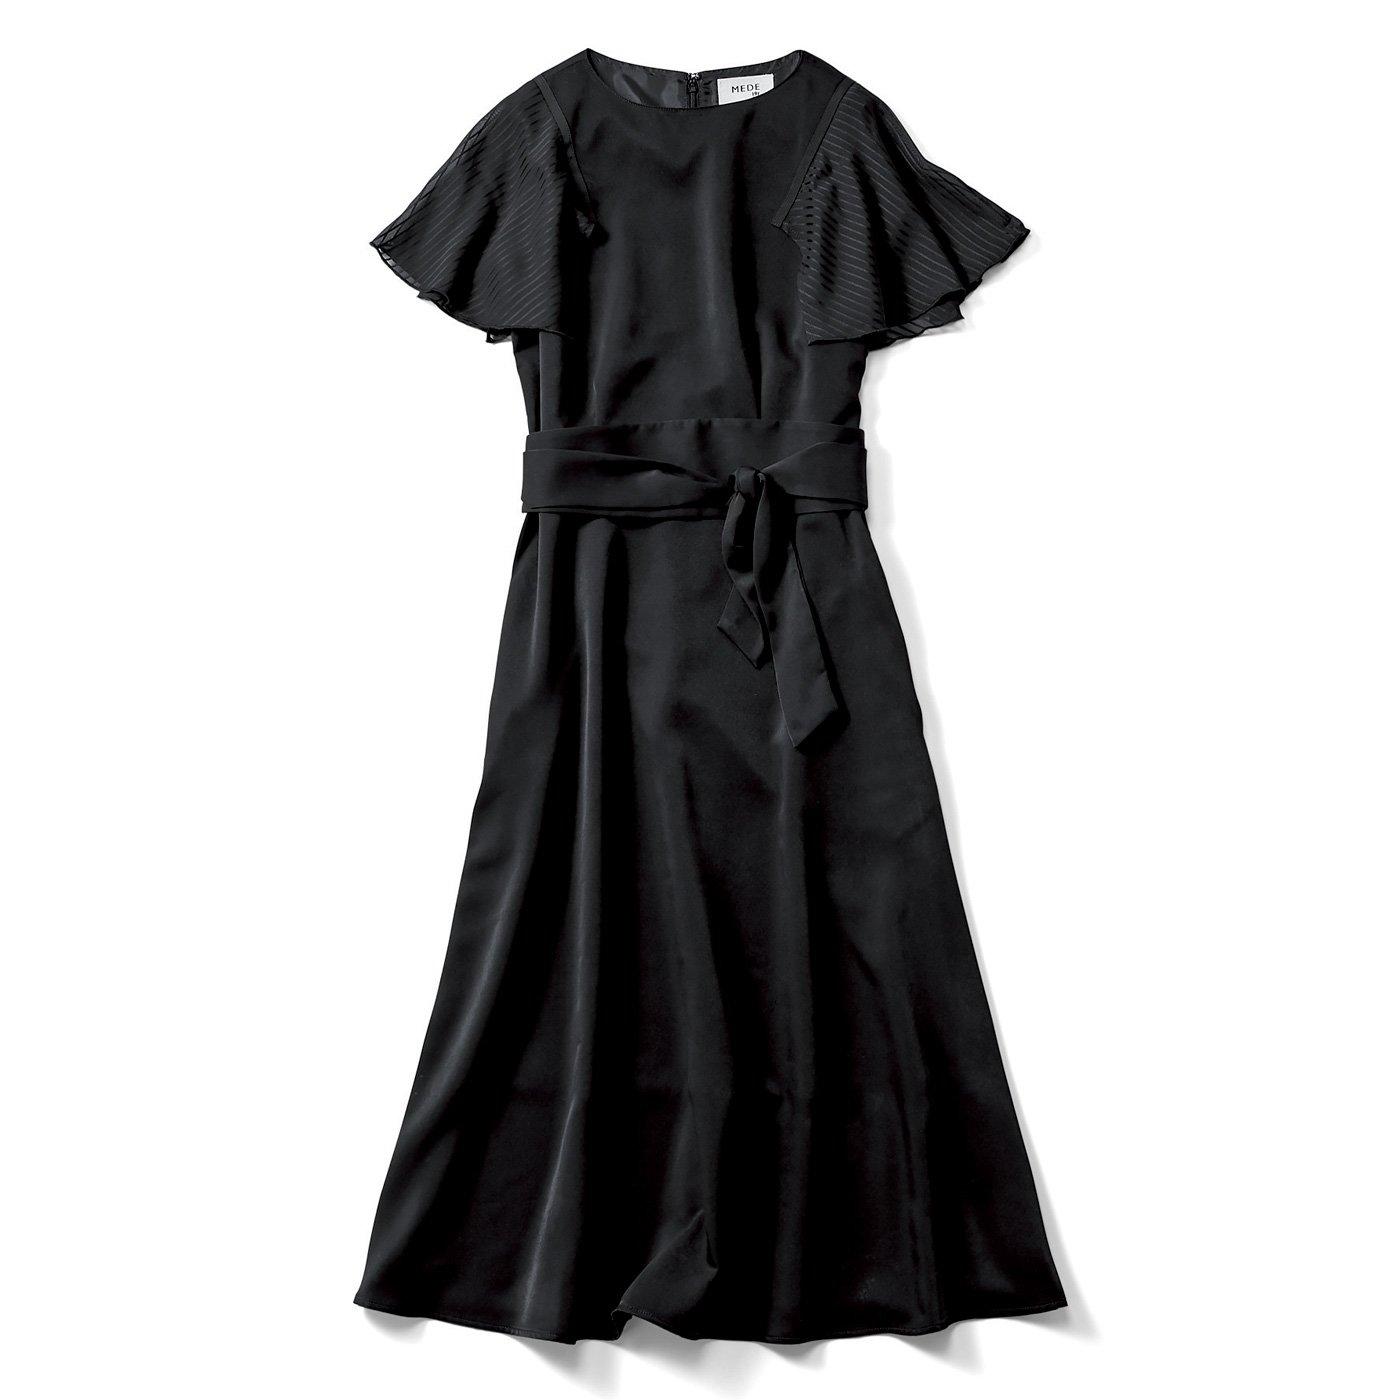 MEDE19F ノーブルな印象のブラックドレス